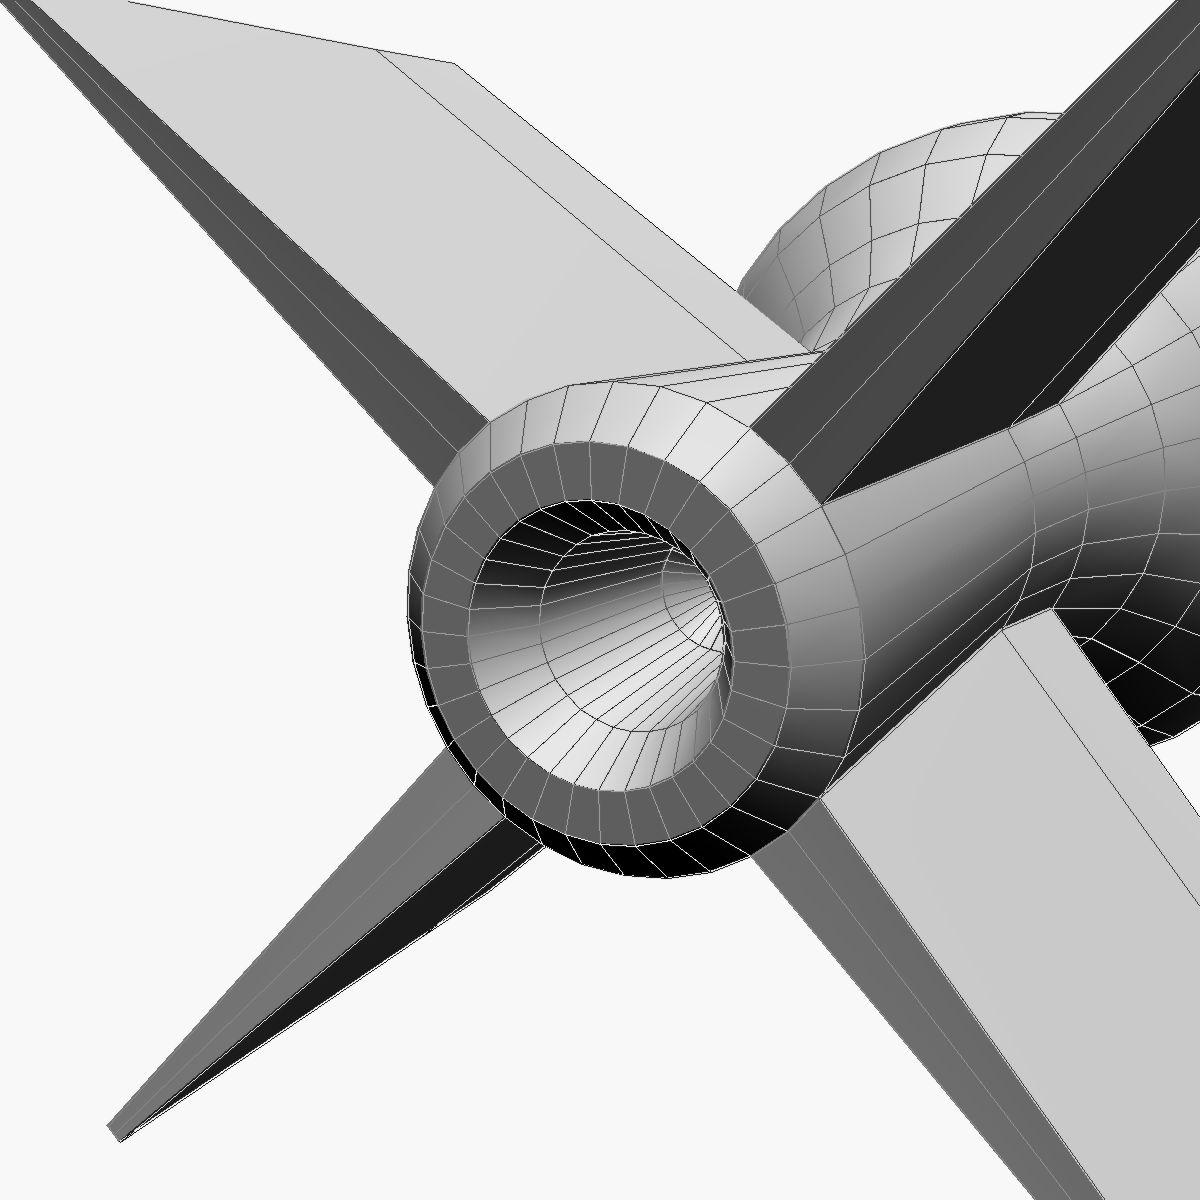 Bomb, Jolly Roger scheme 3d model 3ds dxf fbx blend cob dae X obj 162676